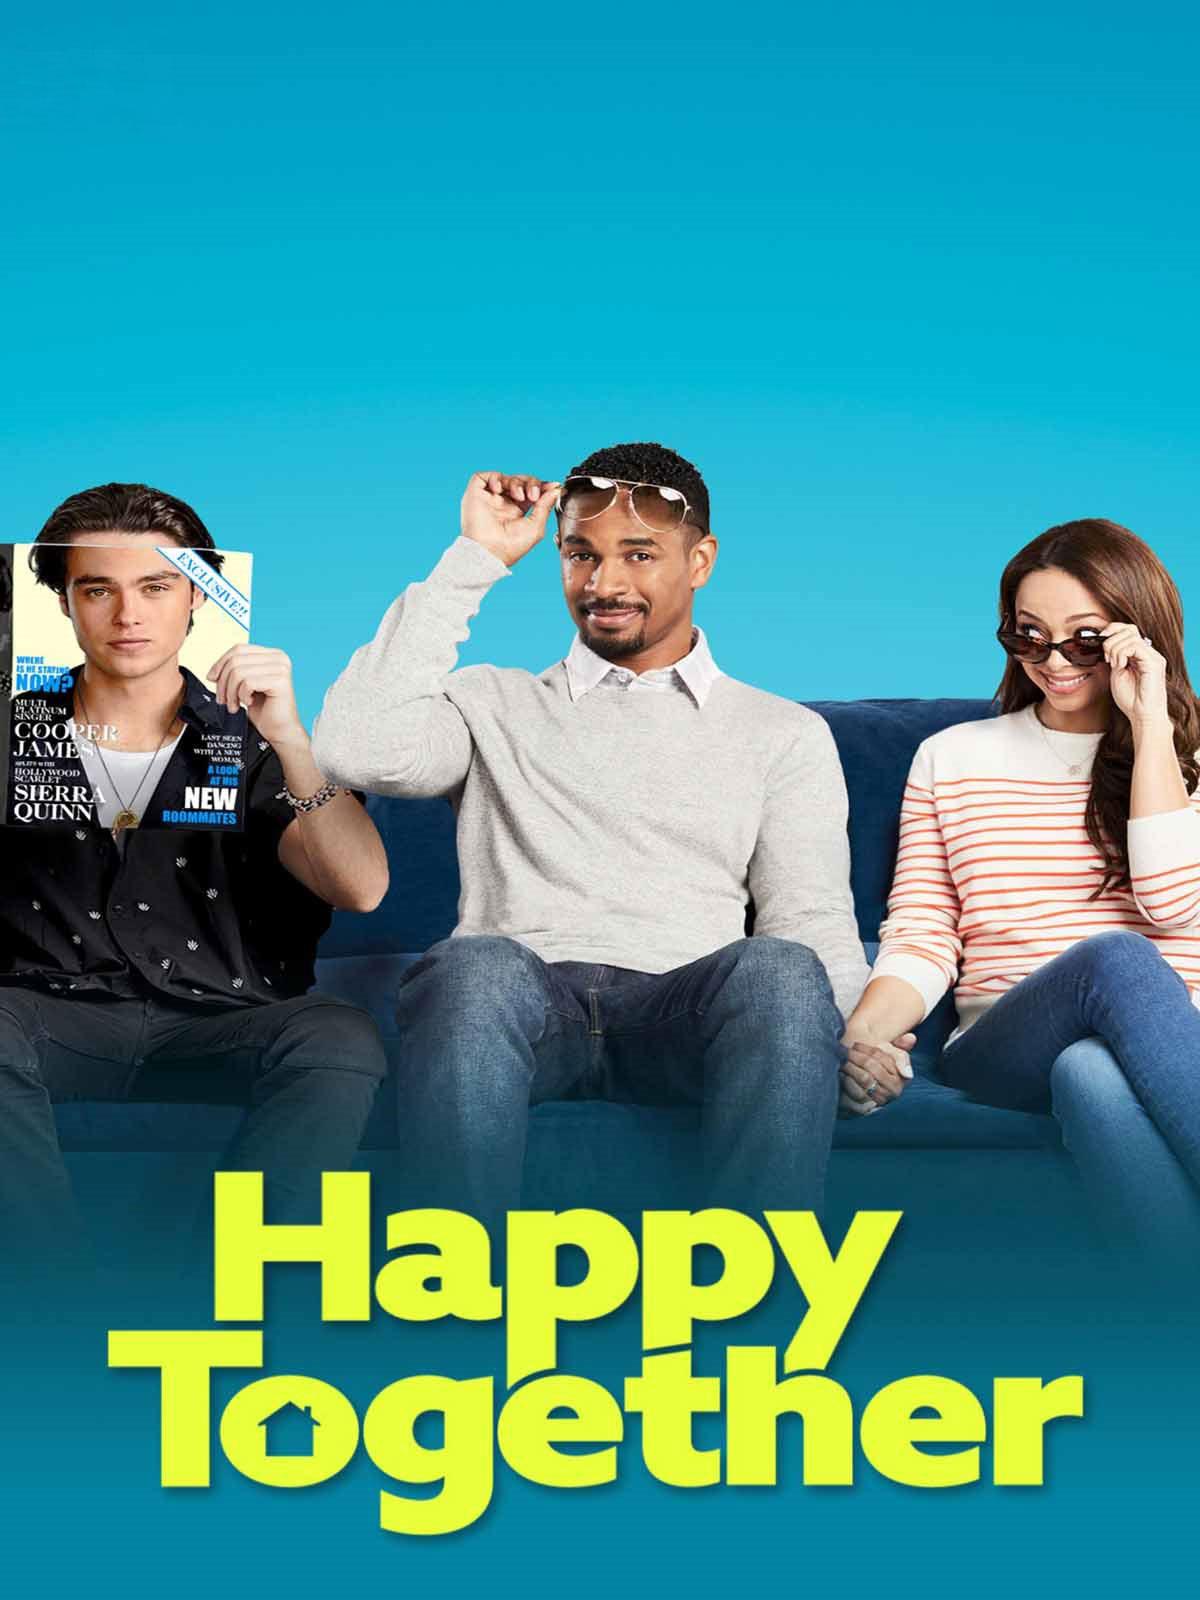 Happy together 2018 heechul episode Kimcartoon